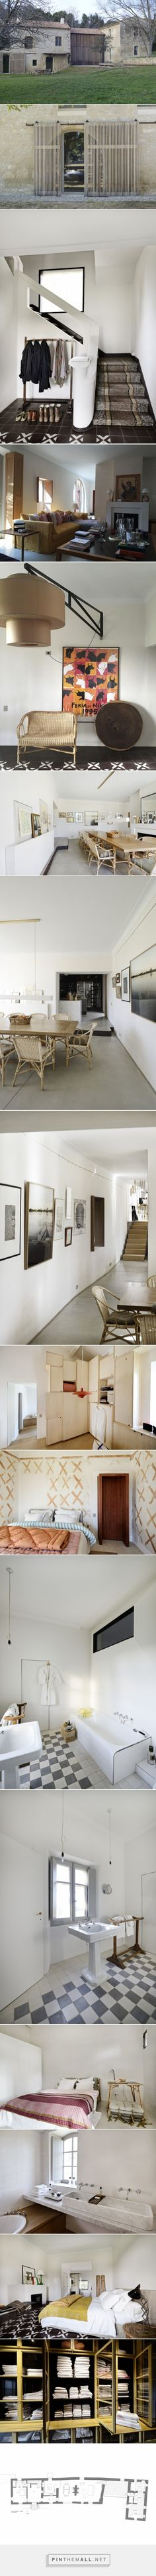 Provence Farmhouse Provencal Style Made Modern - created via https://pinthemall.net